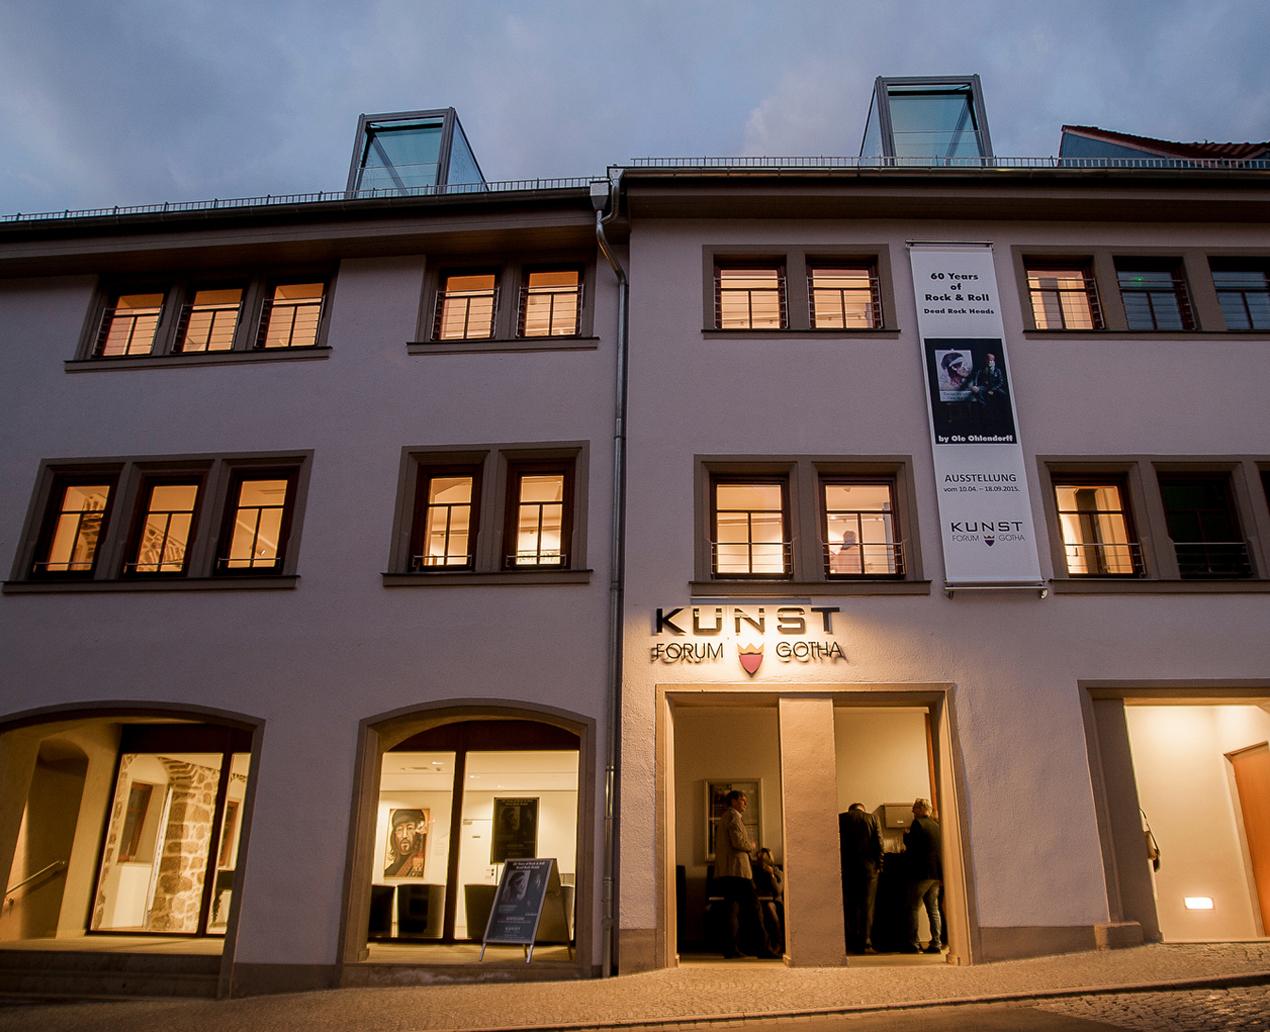 KunstForum ©Archiv KulTourStadt Gotha GmbH